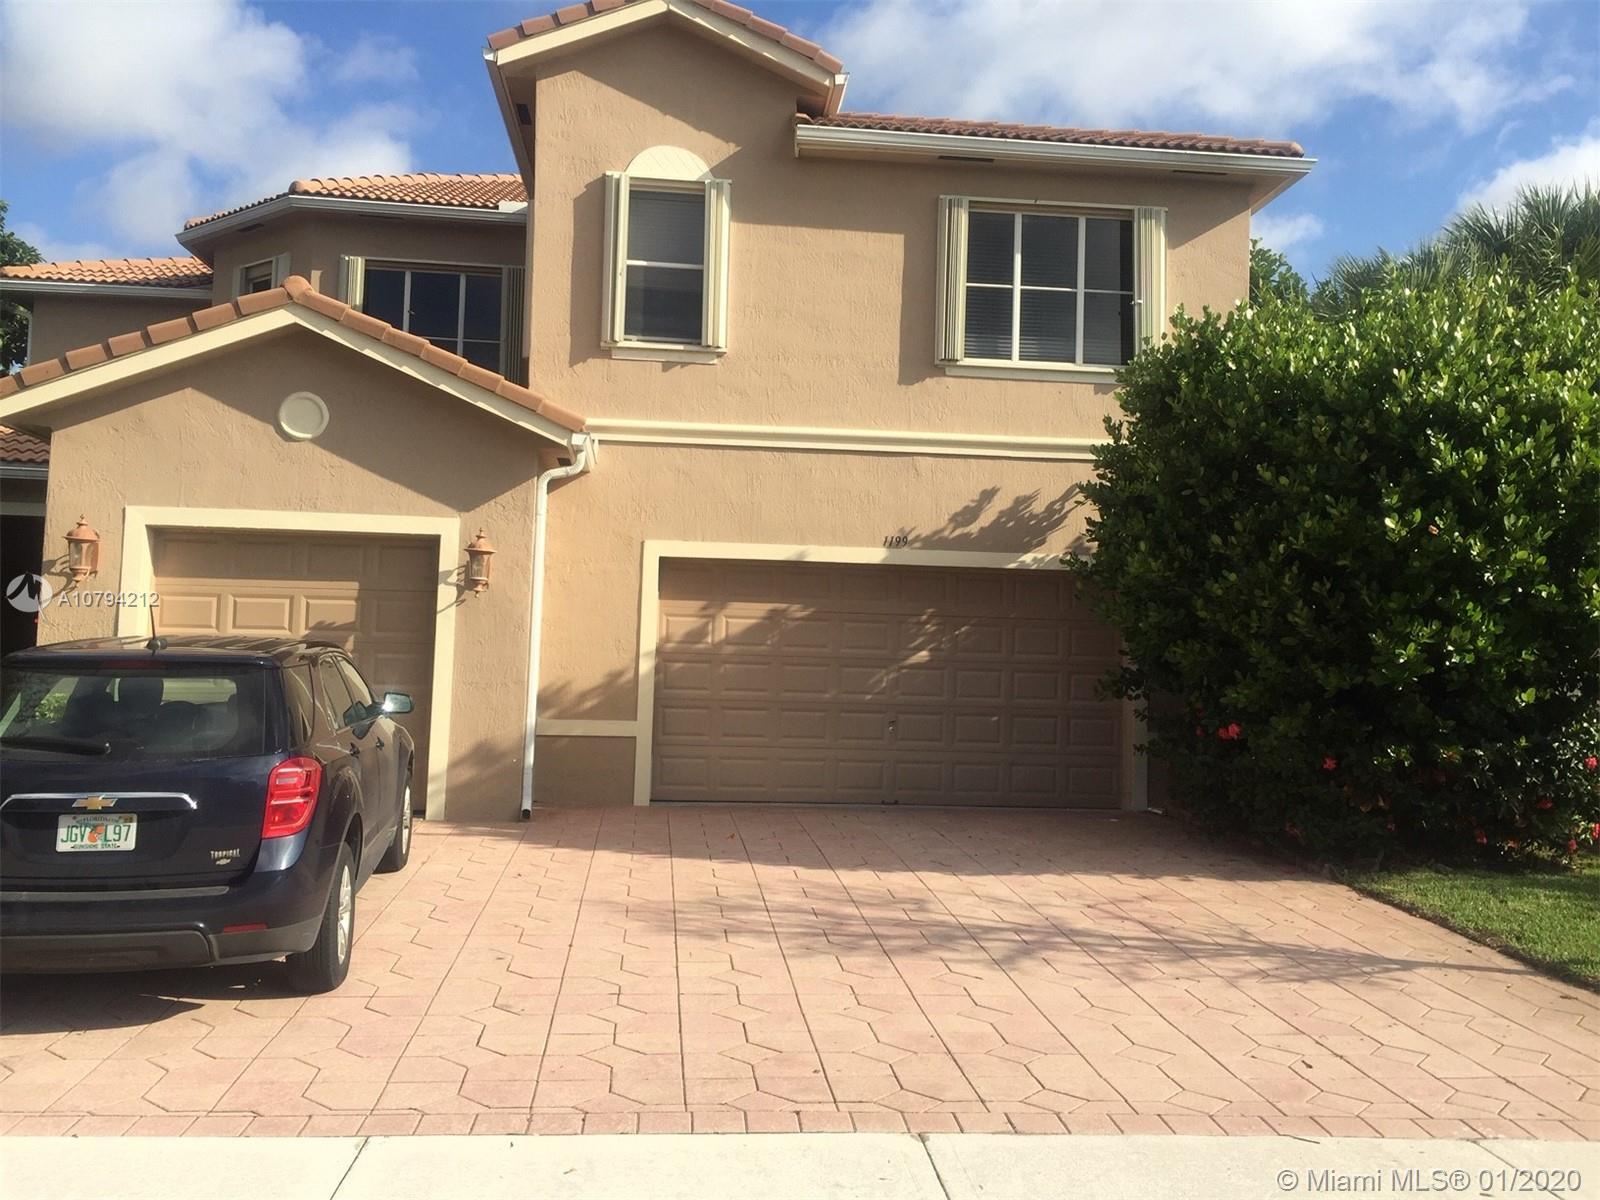 1199 Bay View Way #1, Wellington, FL 33414 - Wellington, FL real estate listing